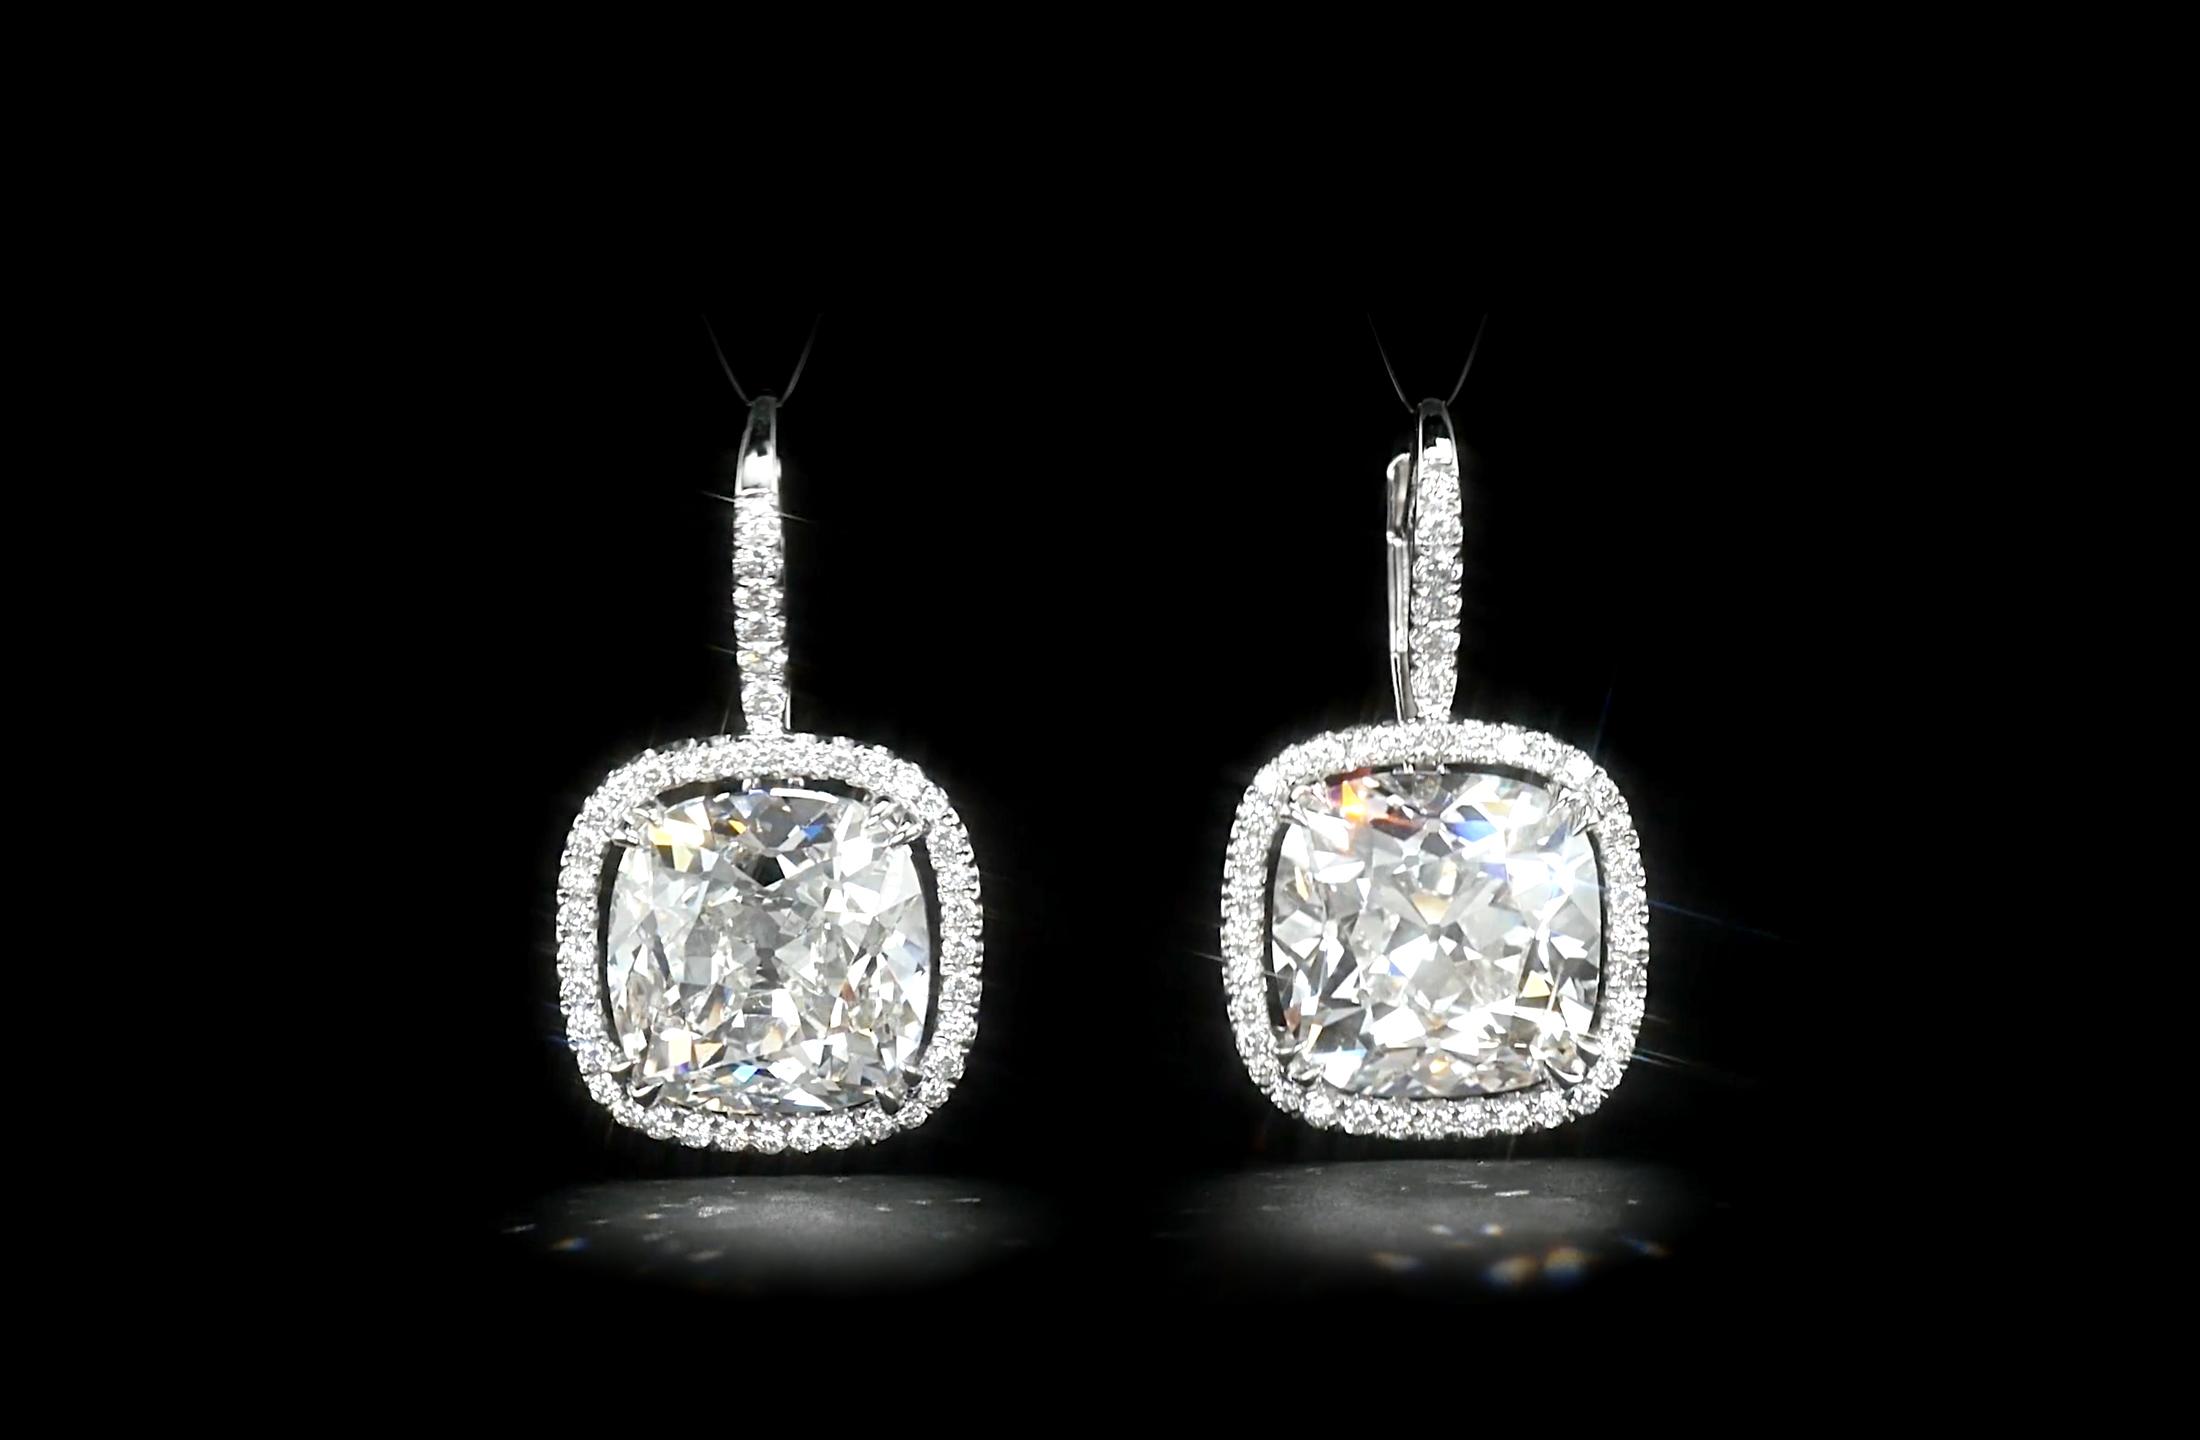 Cushion Cut Drop Earrings In Halo Frames Diamond Runway The Finest Diamonds World